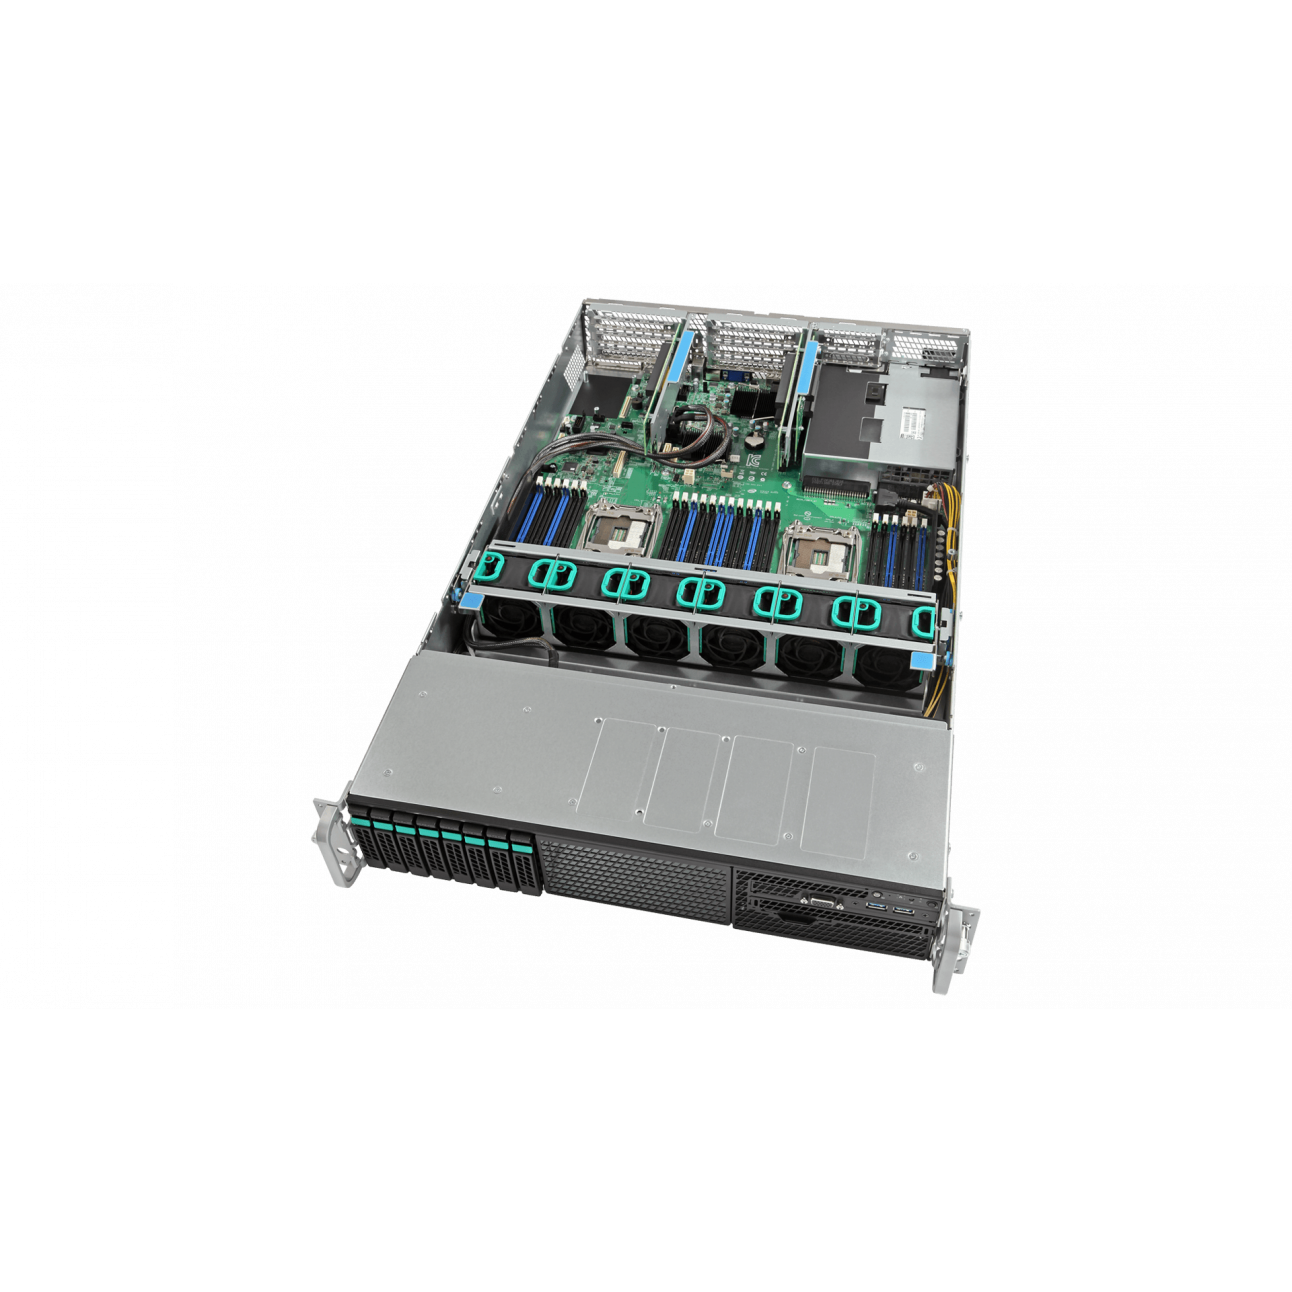 Сервер Intel R2208WT2YSR, 2 процессора Intel E5-2699V4, 128G DDR4, 2x240G SSD, 2x1GE, RPSU